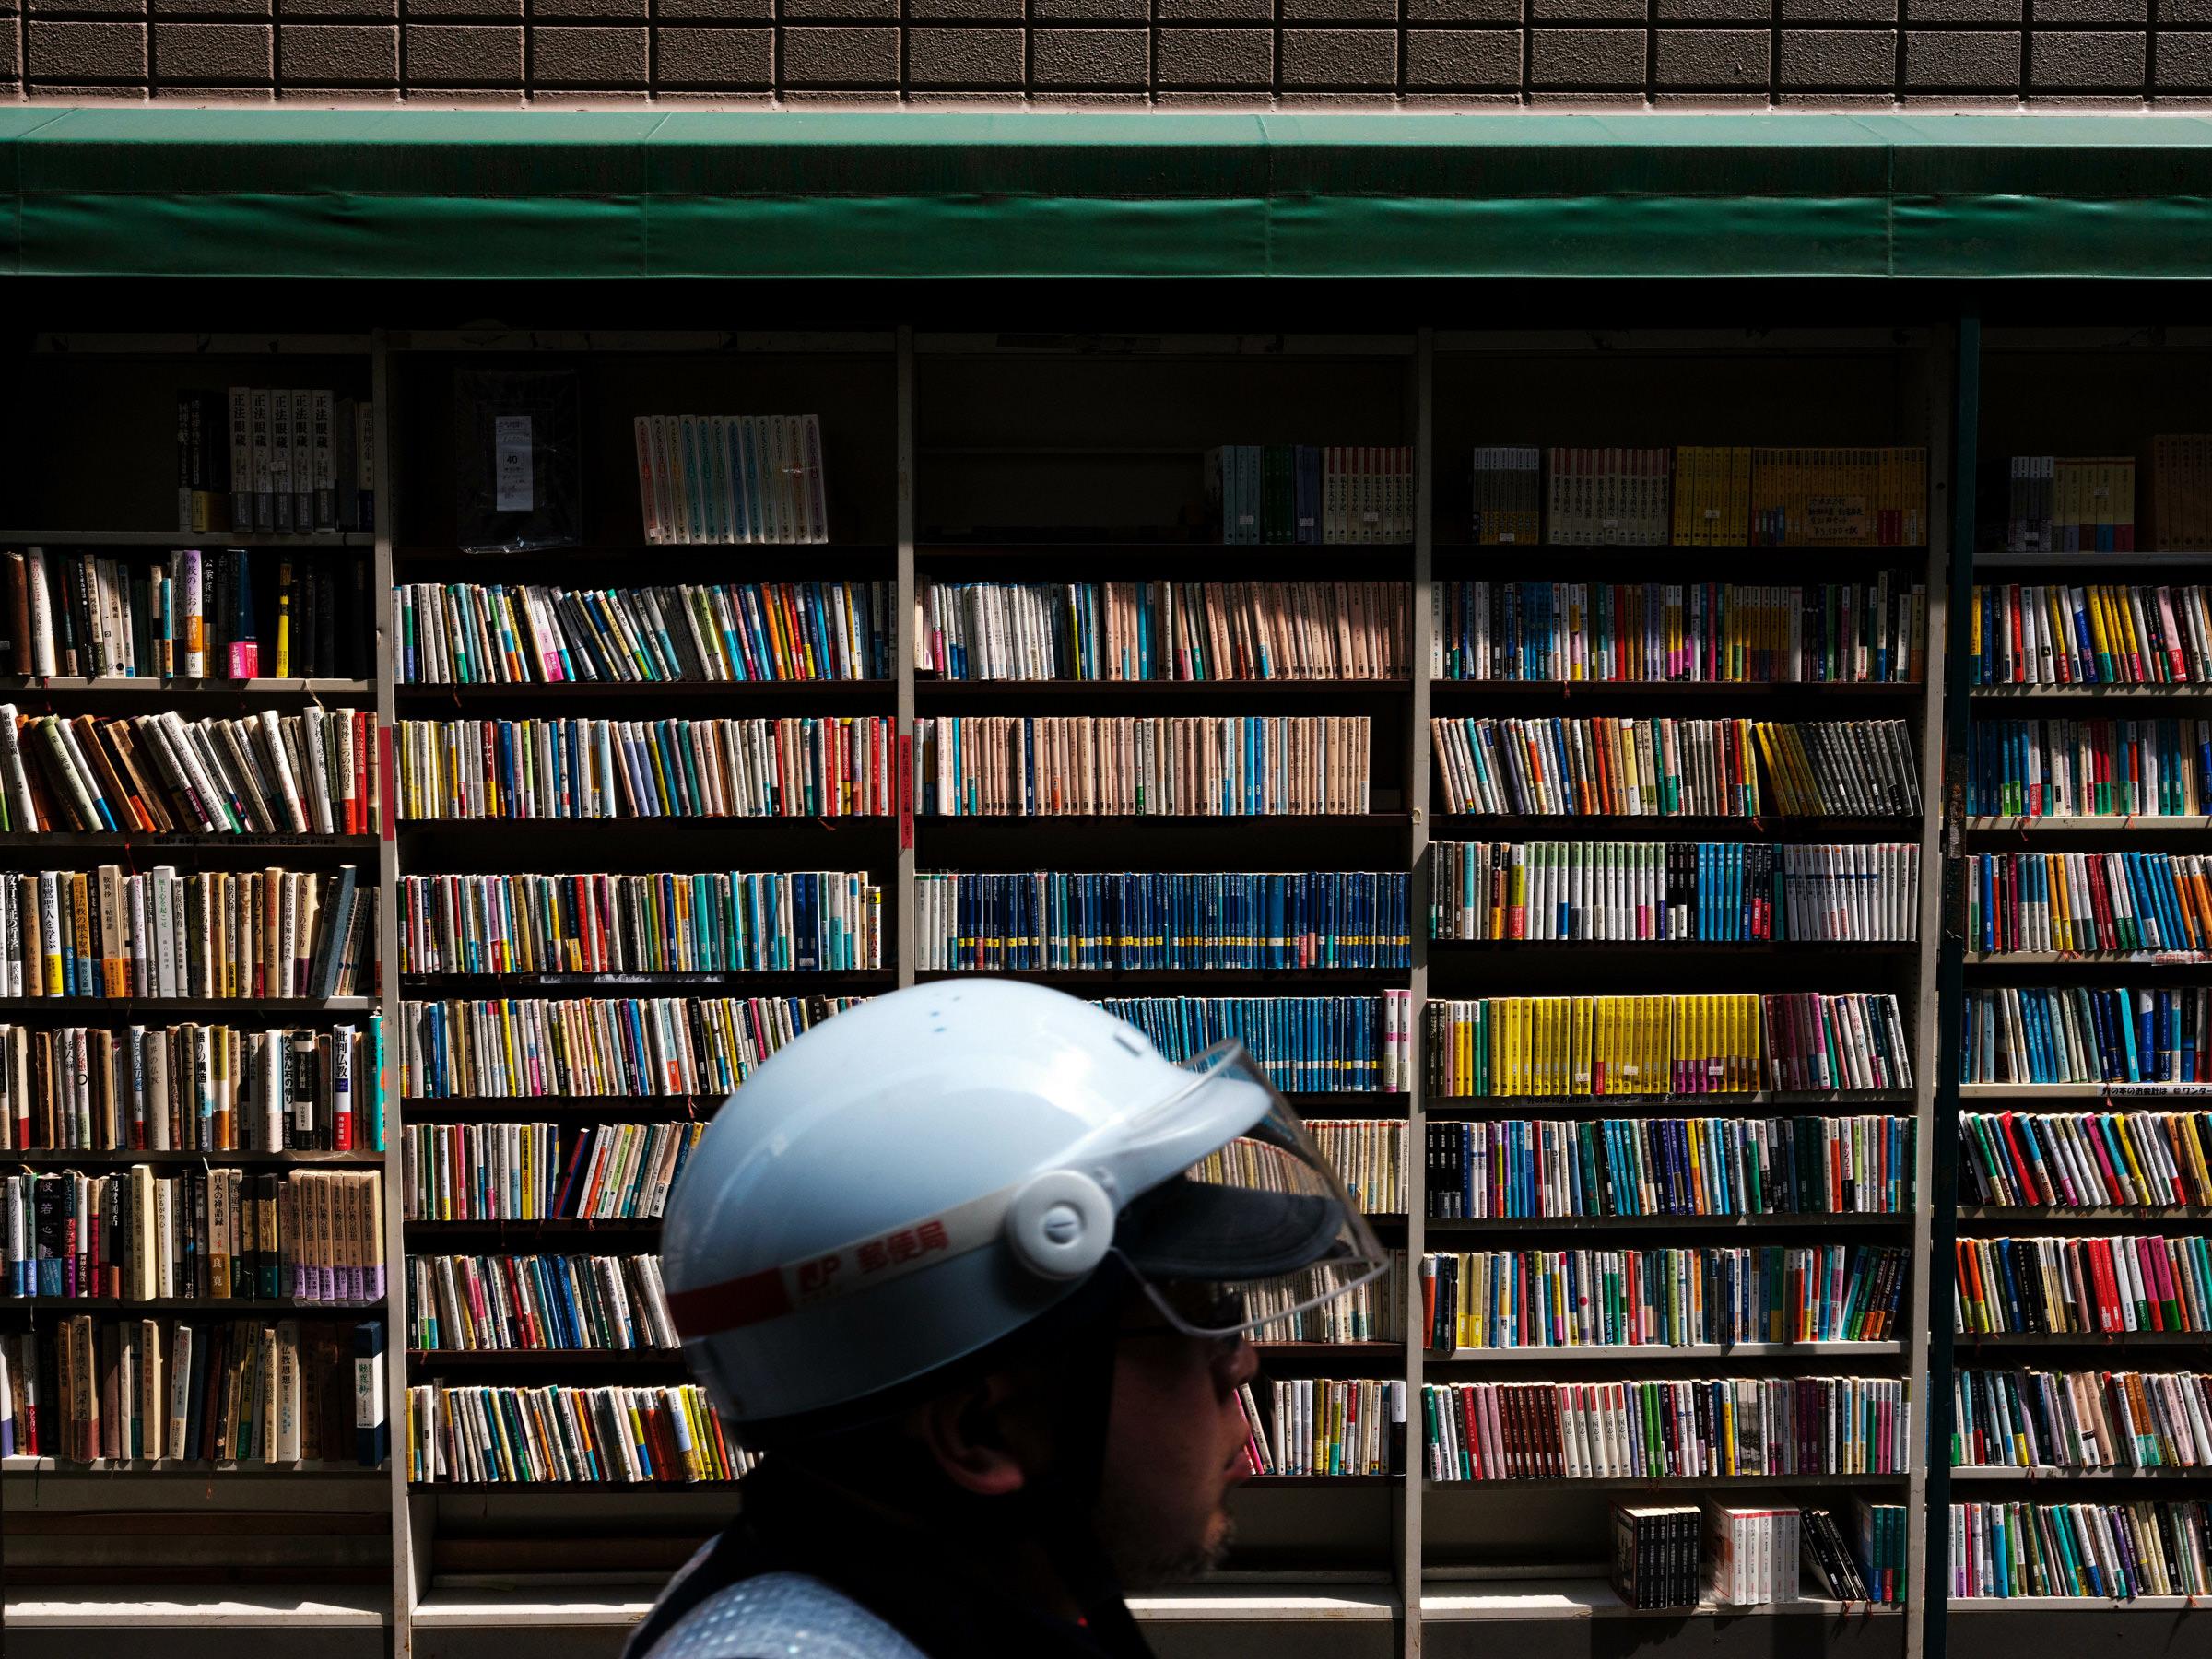 Fujifilm-GFX-Japan-Street-Photography-11